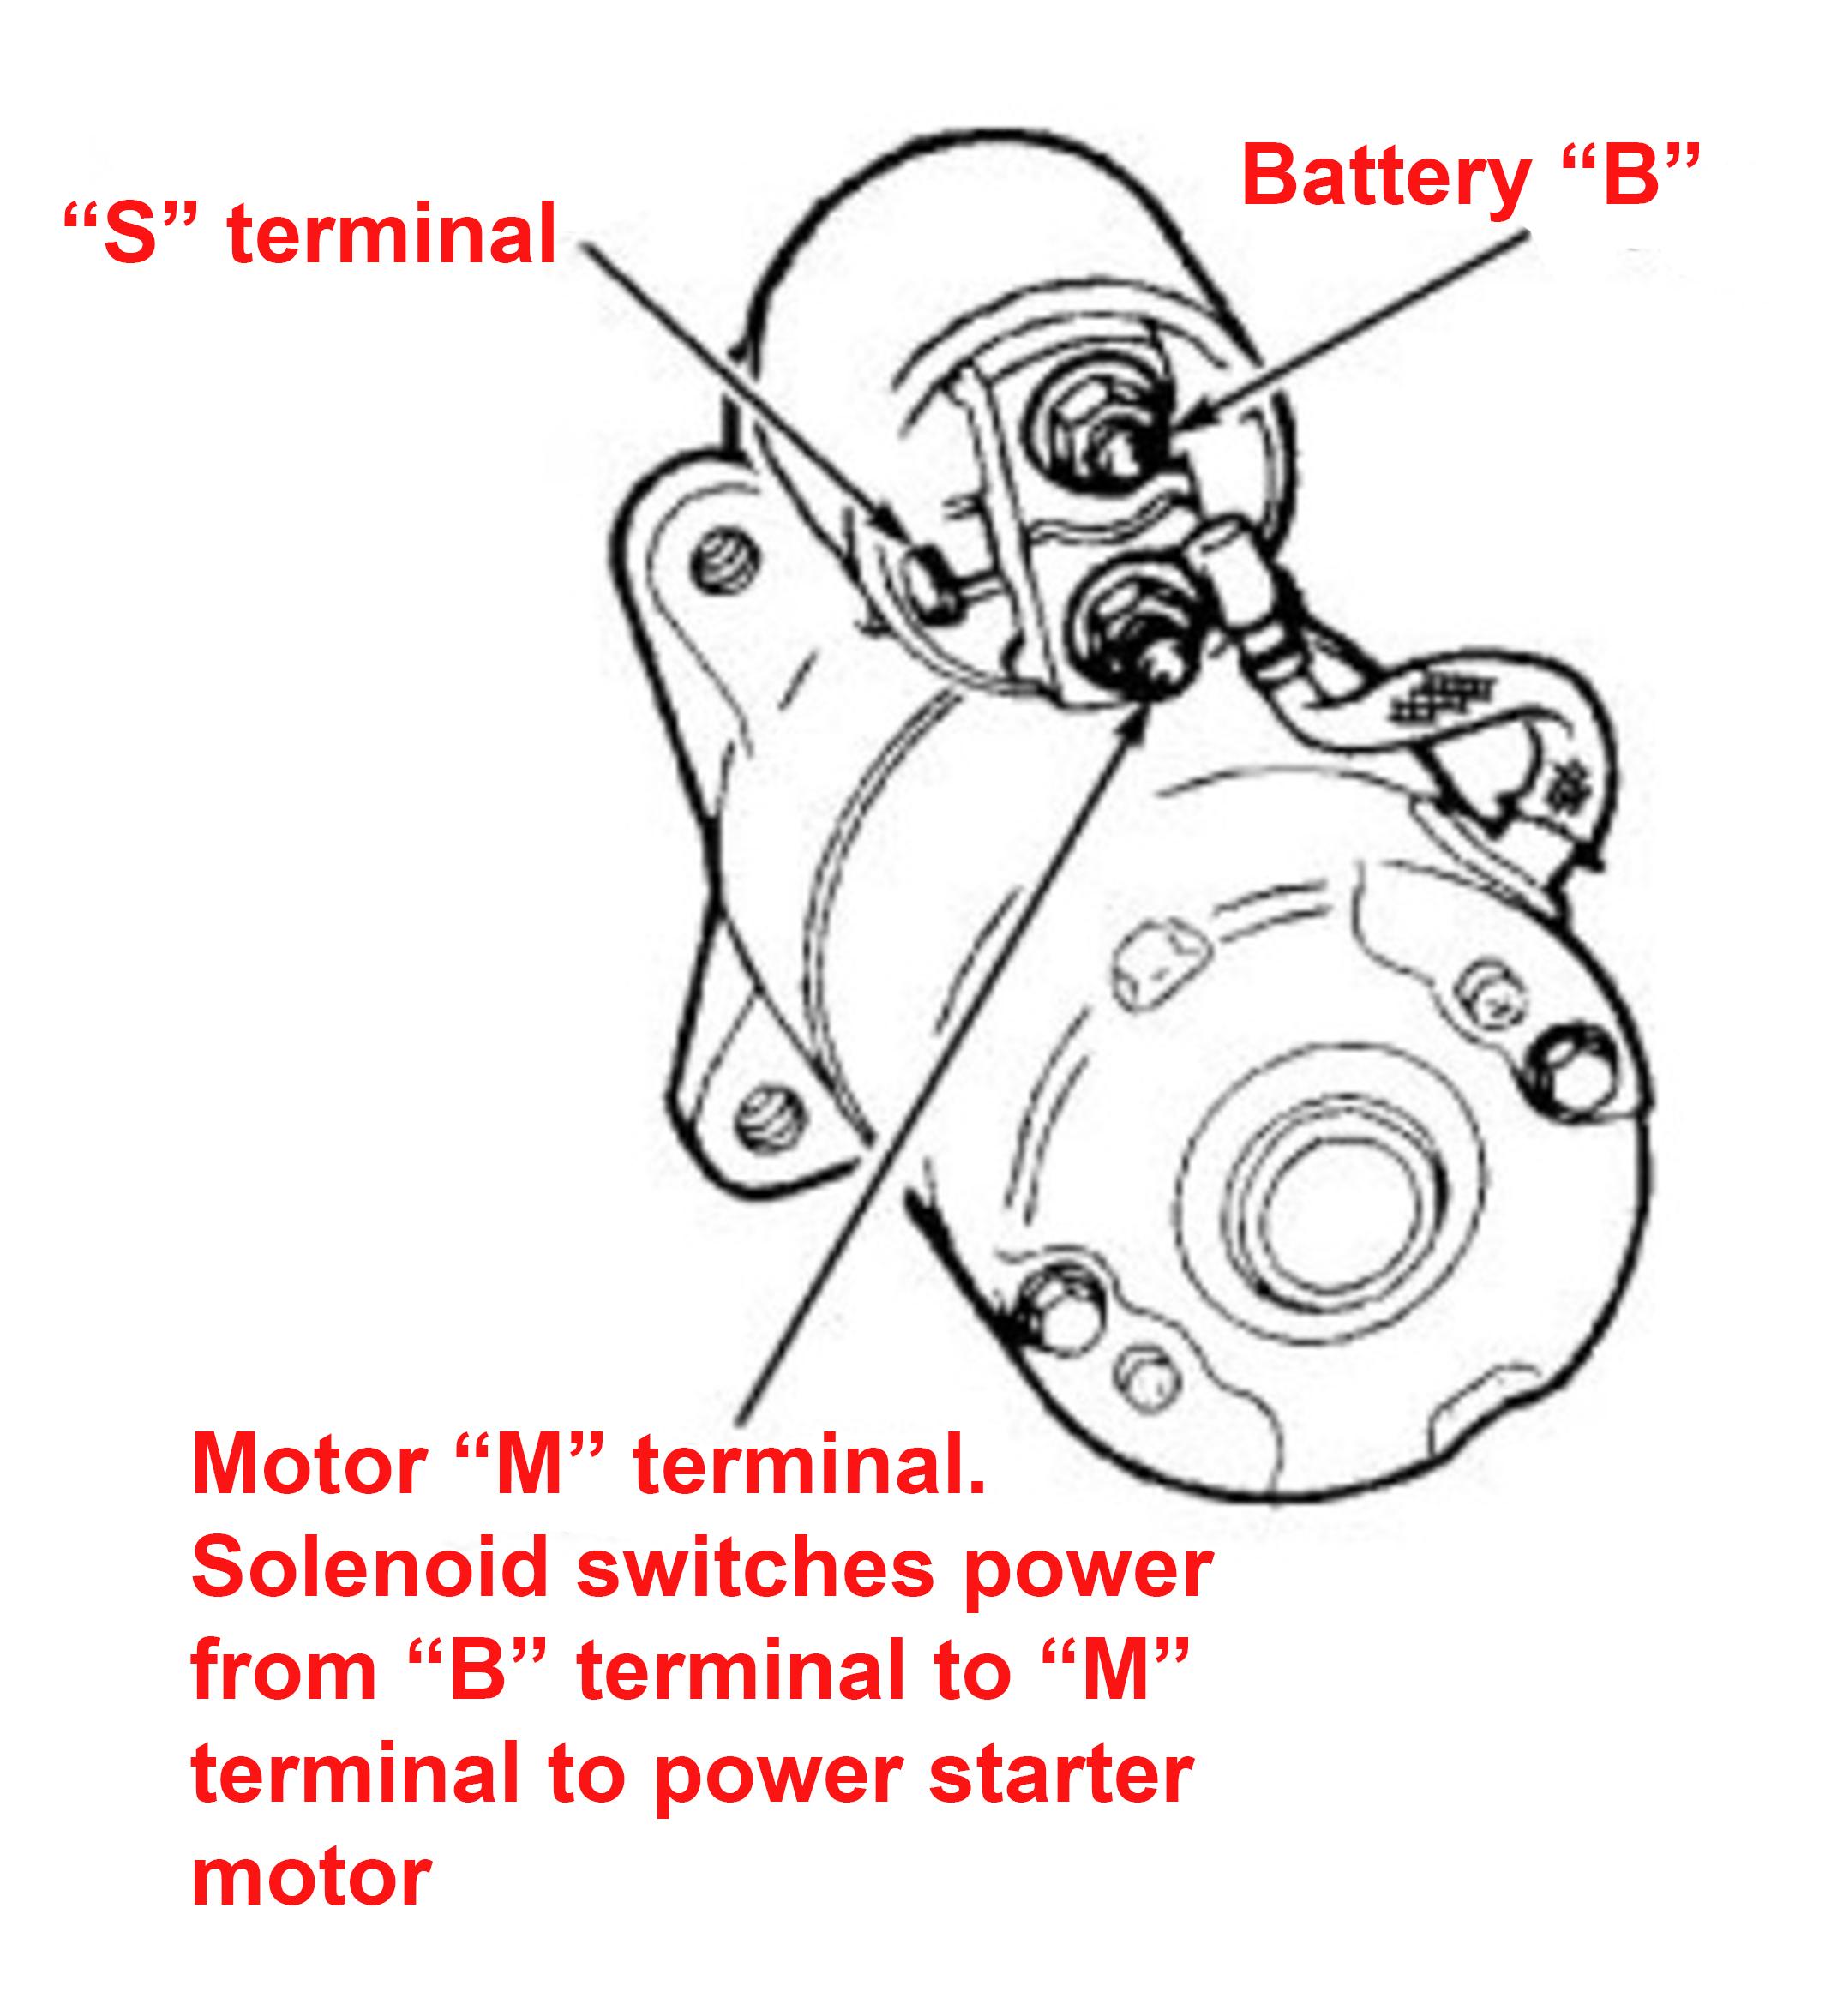 chevy lumina battery change related keywords suggestions 1998 chevy lumina starter wiring diagram buick reatta